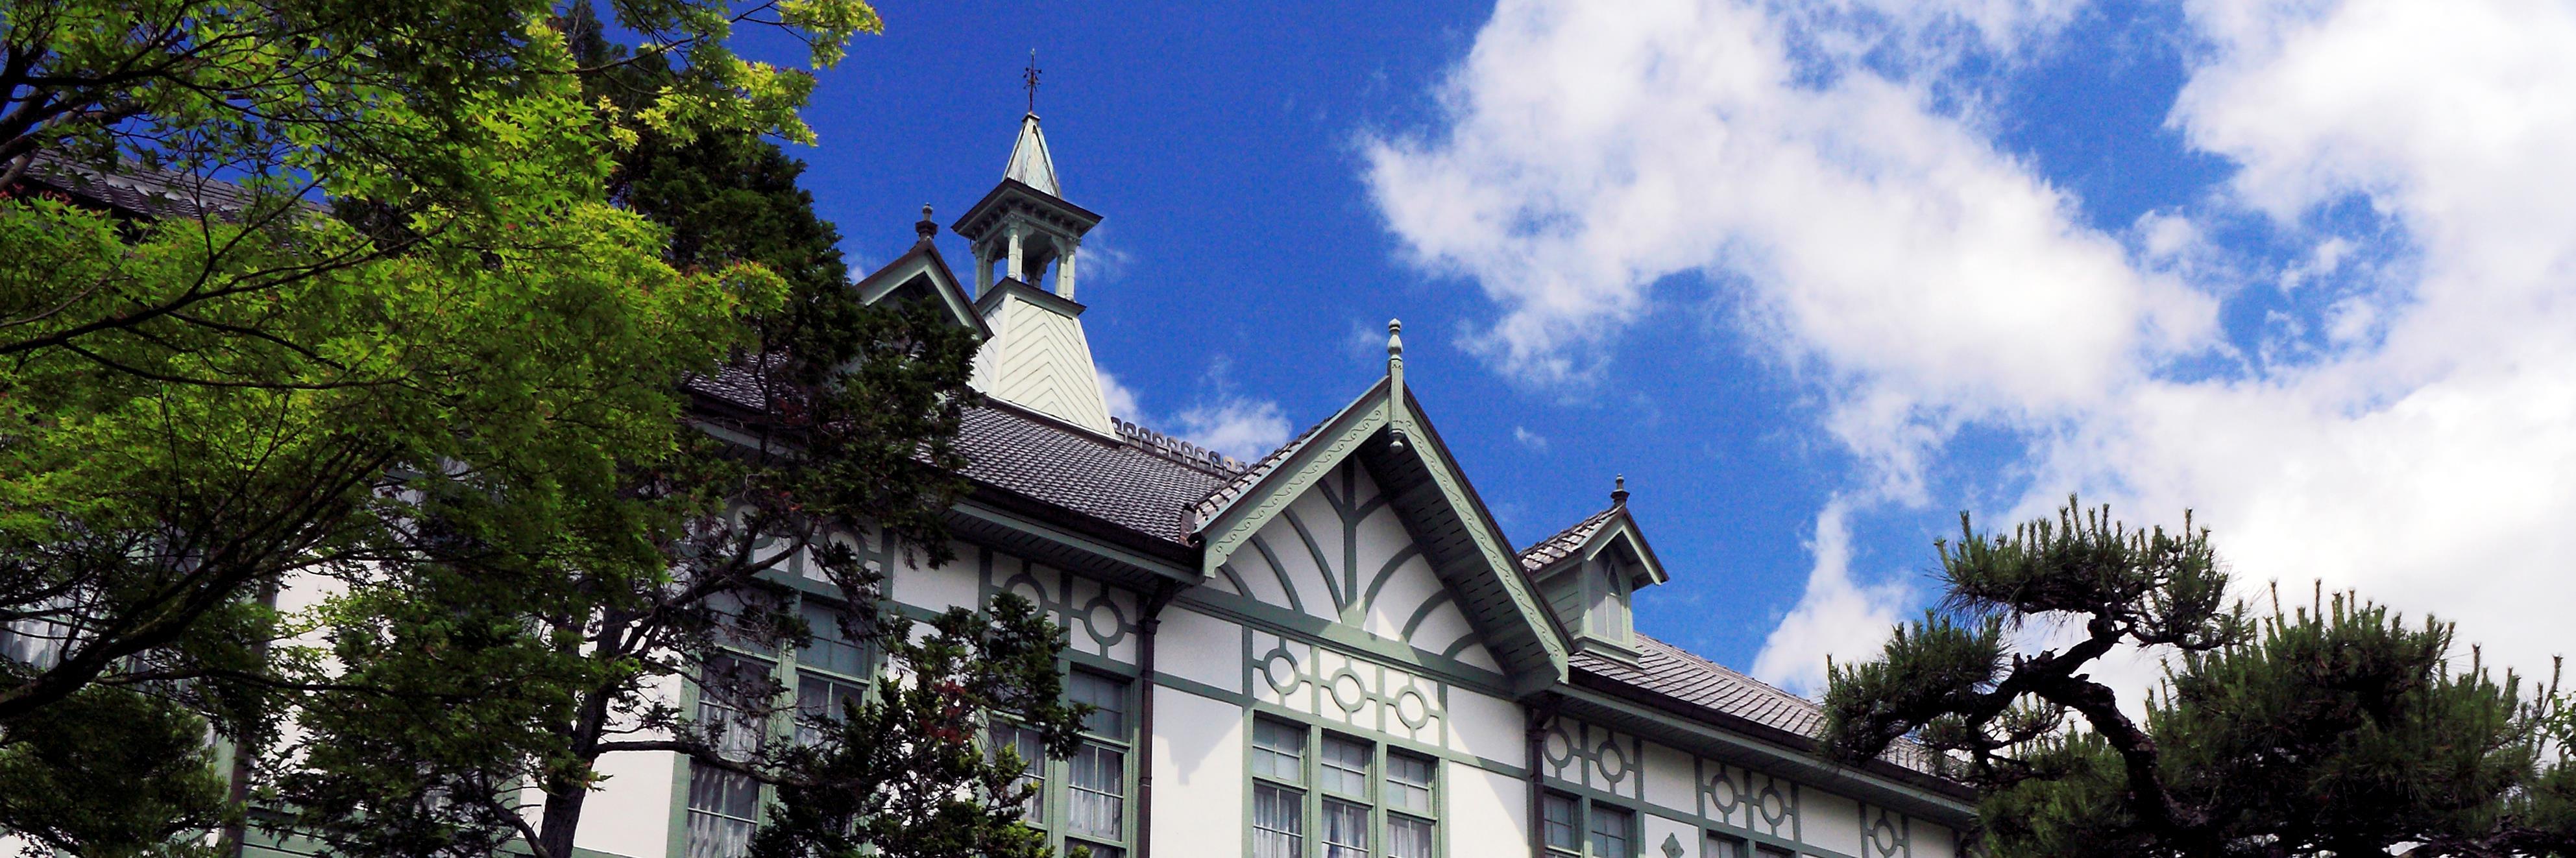 Nara Women's University's official Twitter account